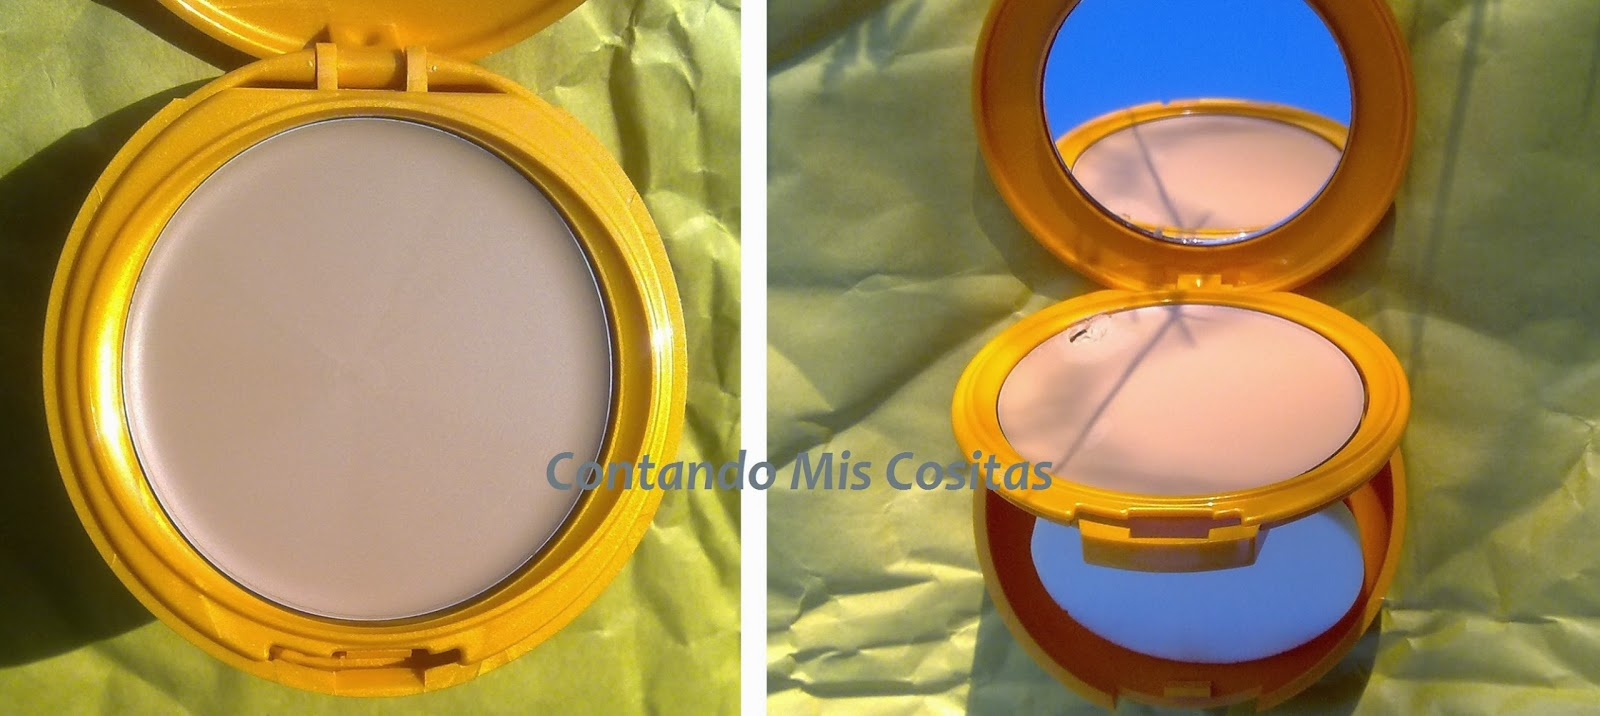 Swatches maquillaje solar Vichy SPF30 Beige Sand